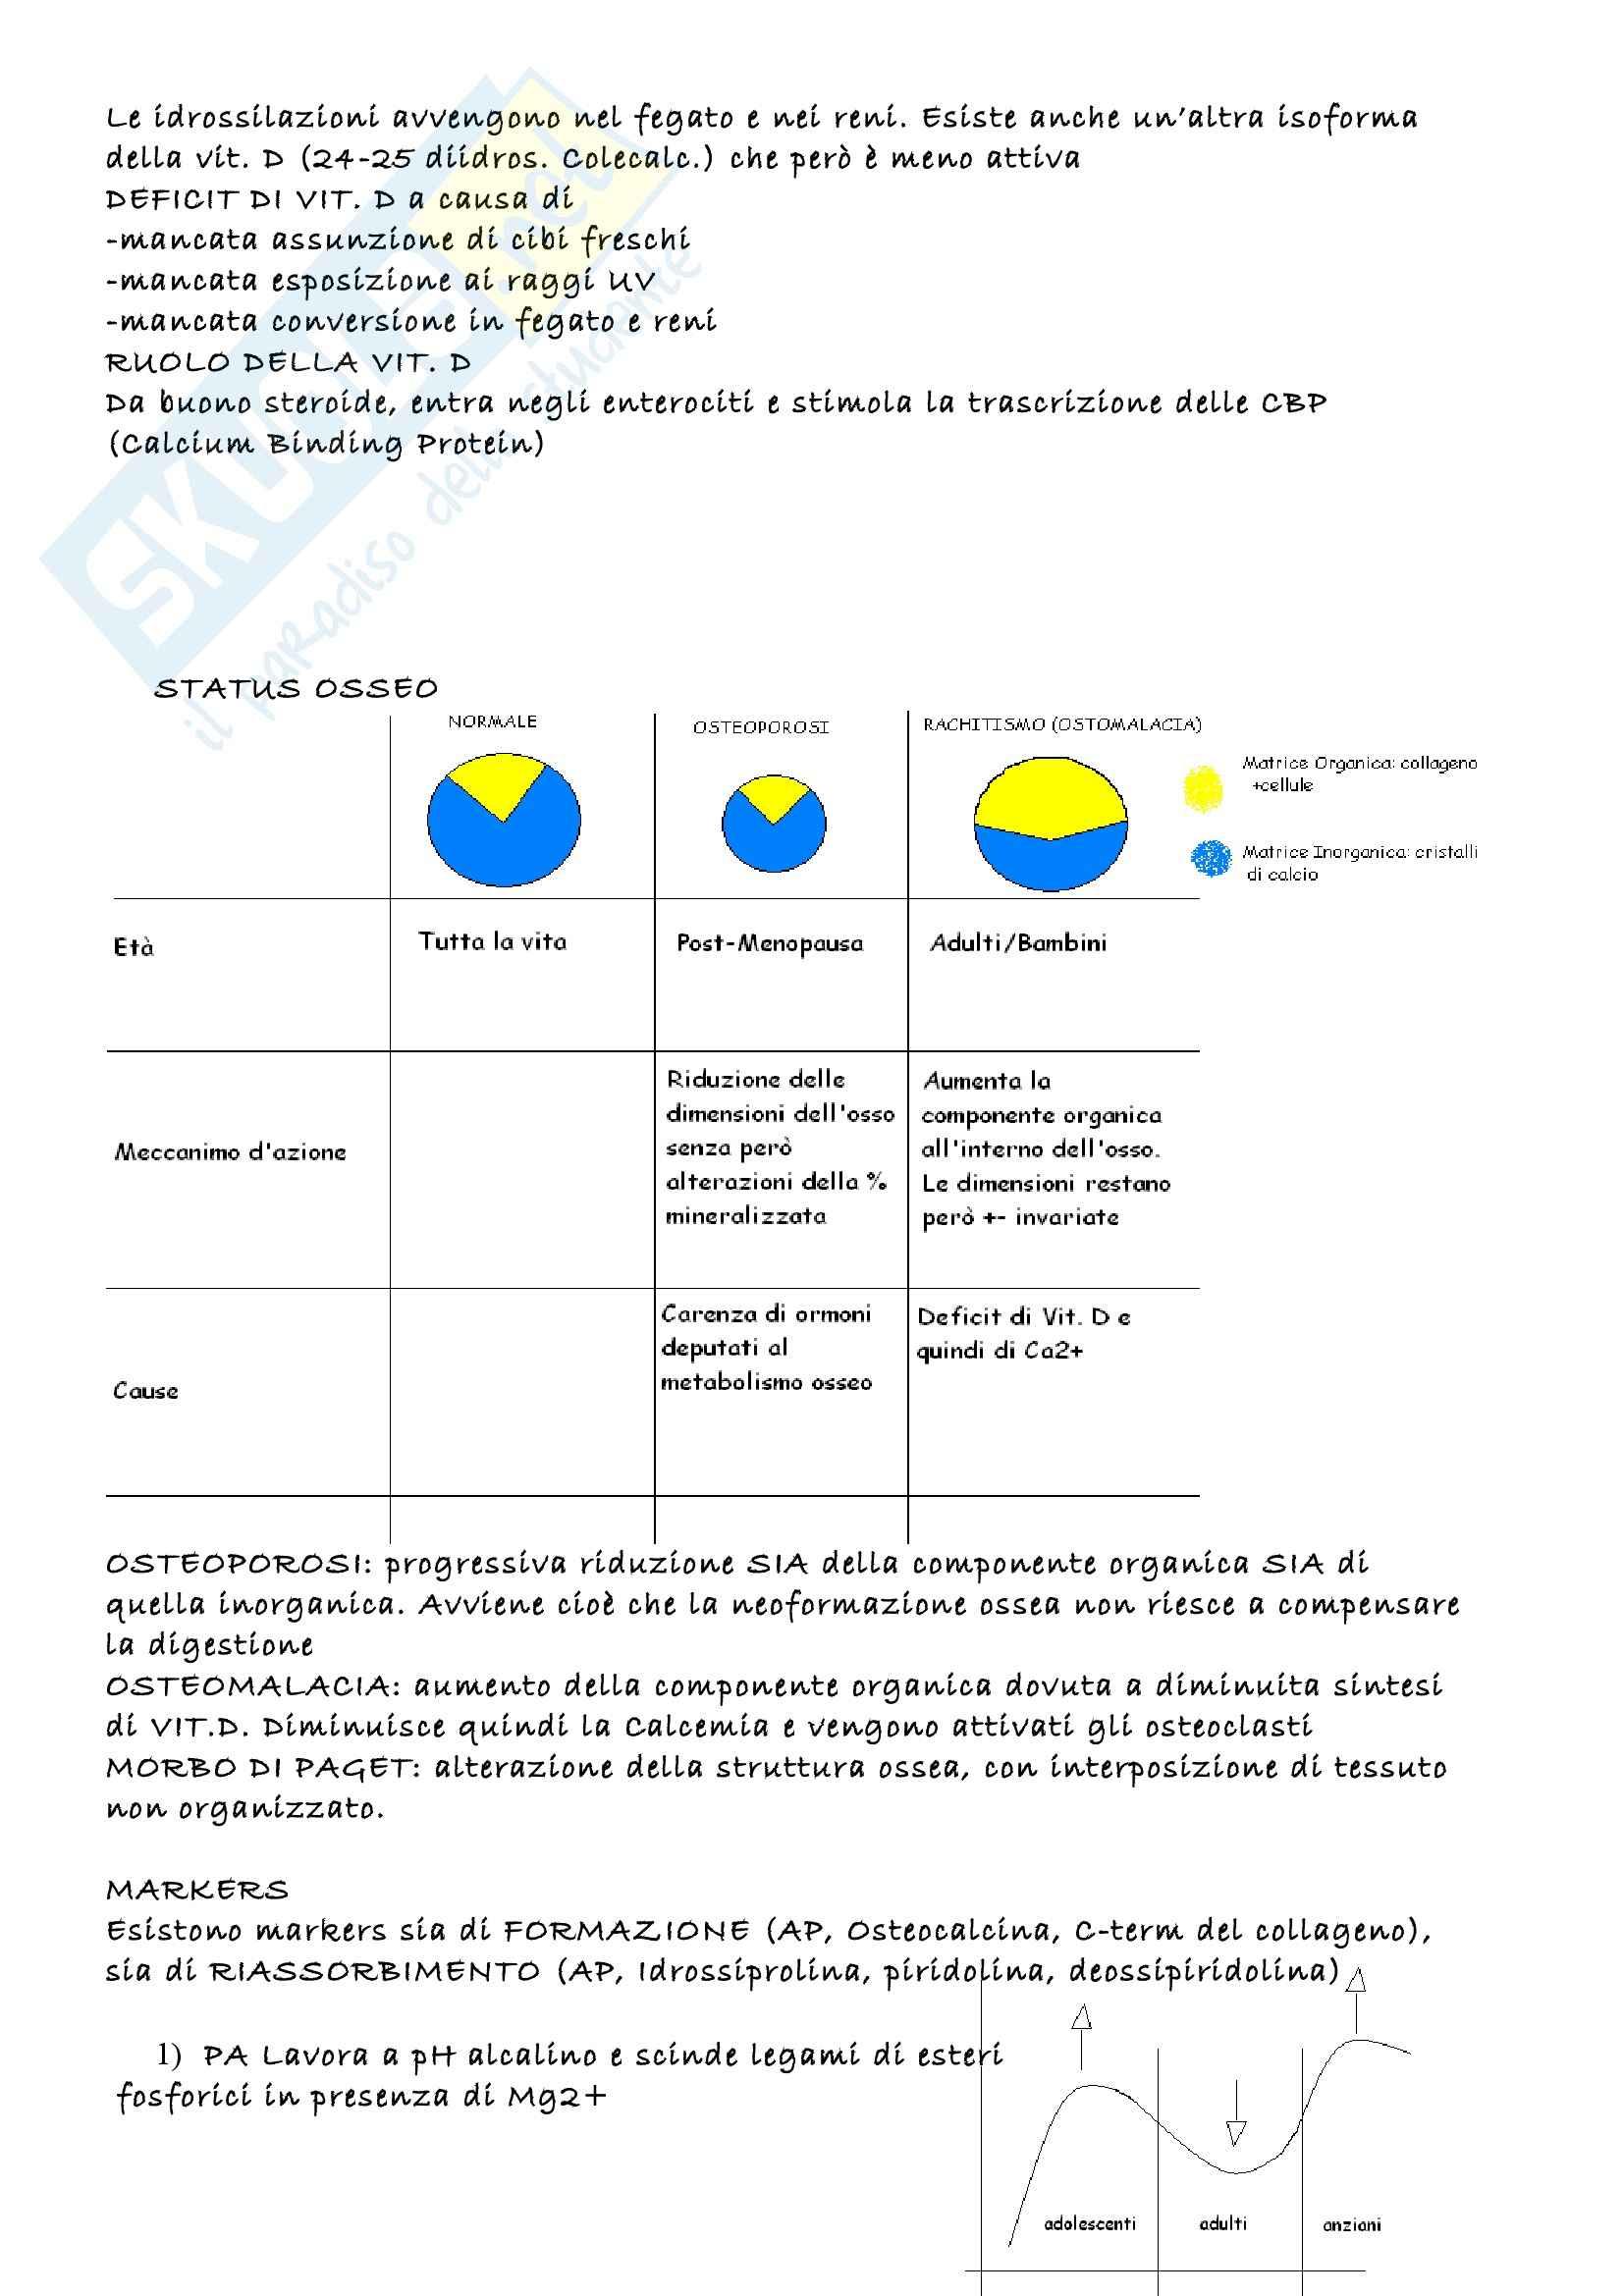 Biochimica clinica - Appunti Pag. 36